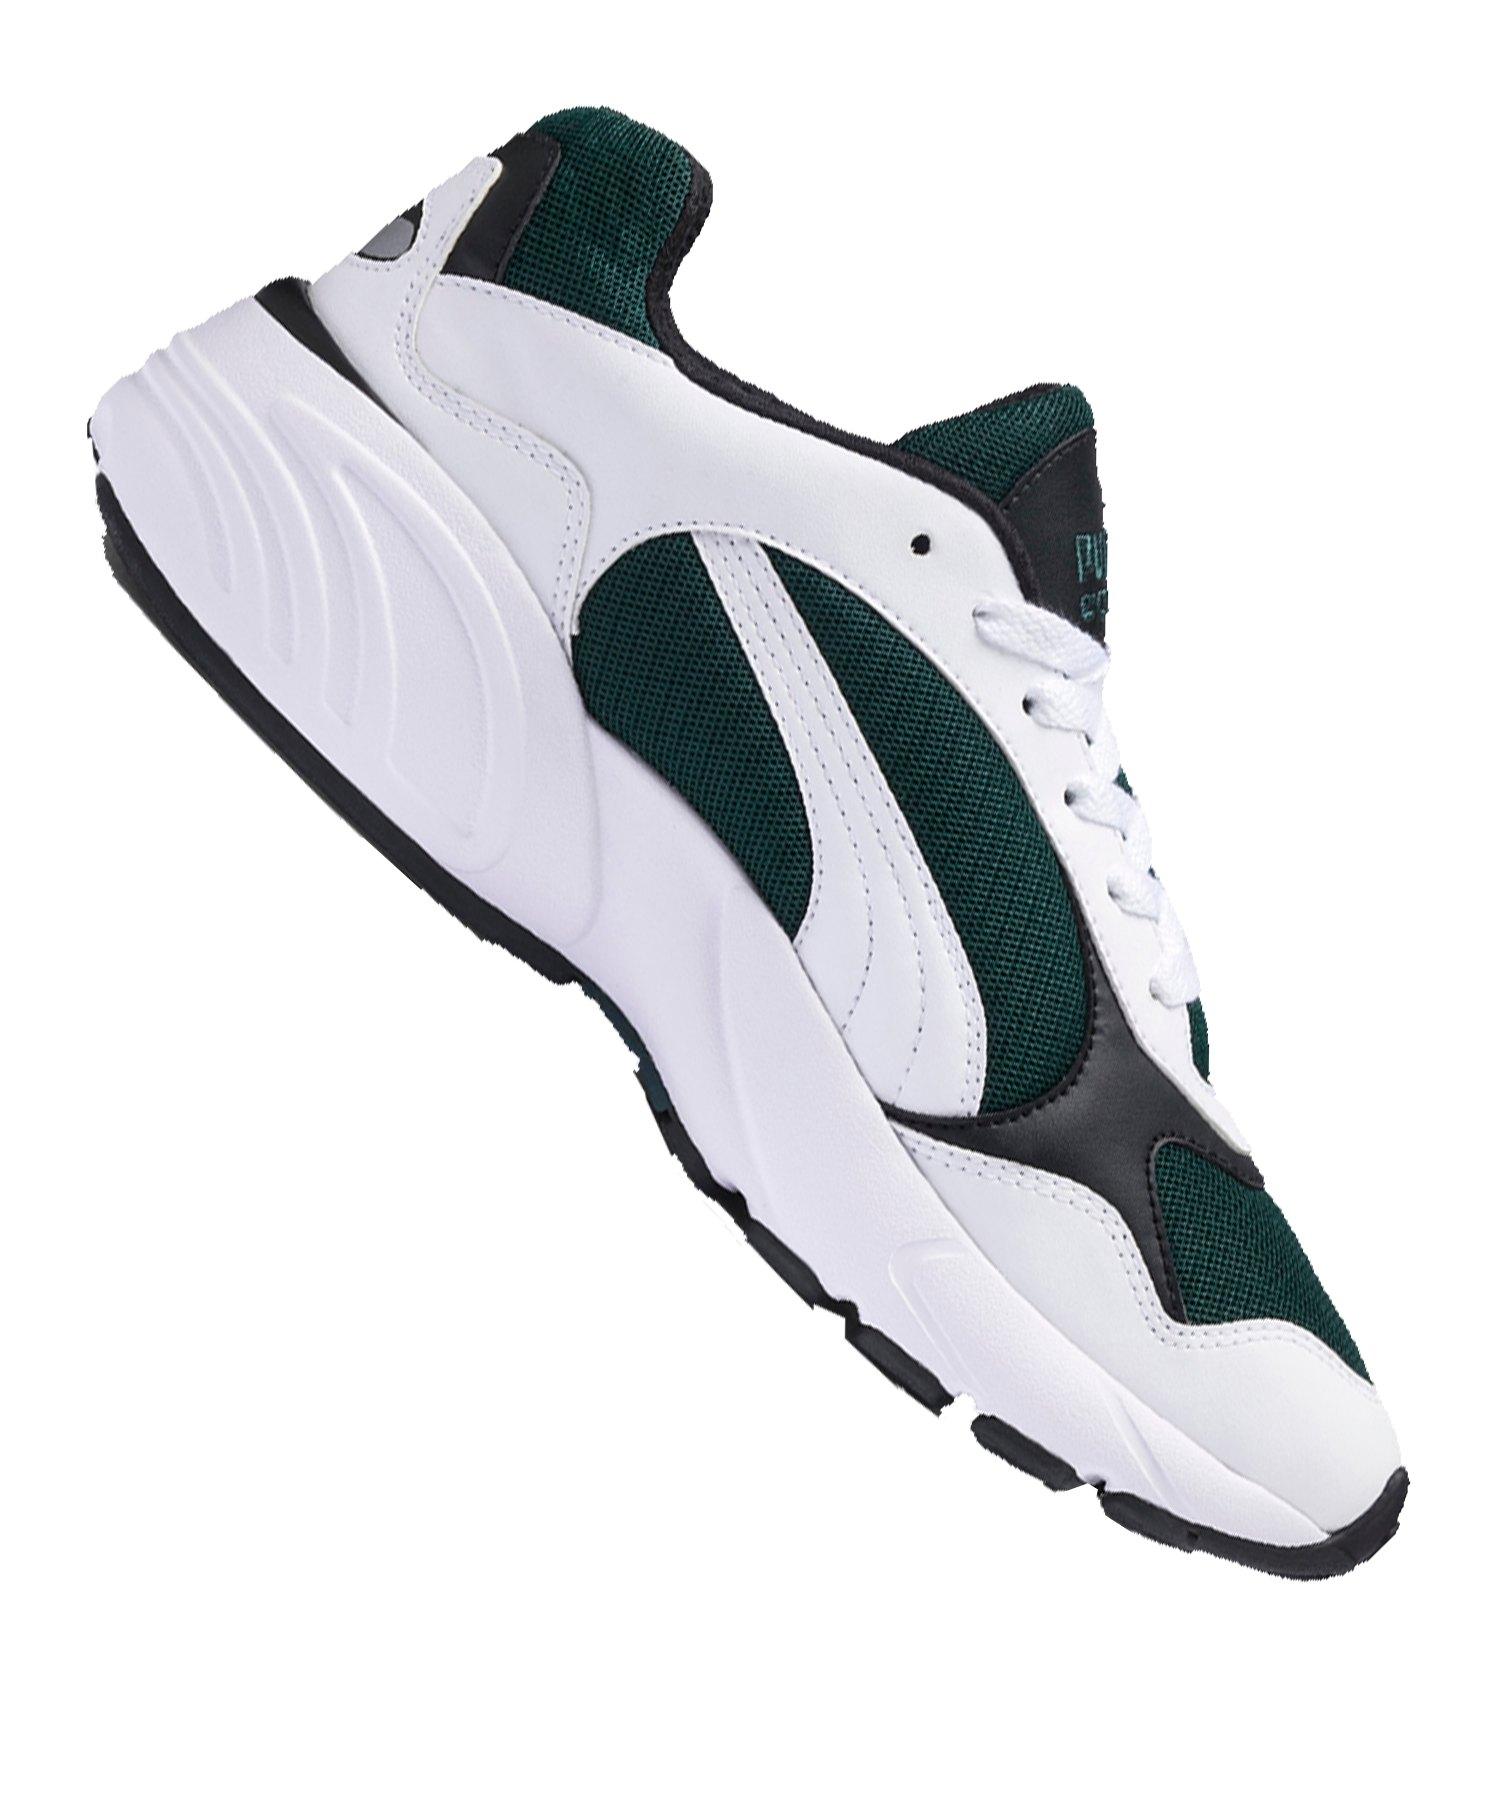 Puma Attaq Herren Turnschuhe Schuhe Größe Neu: